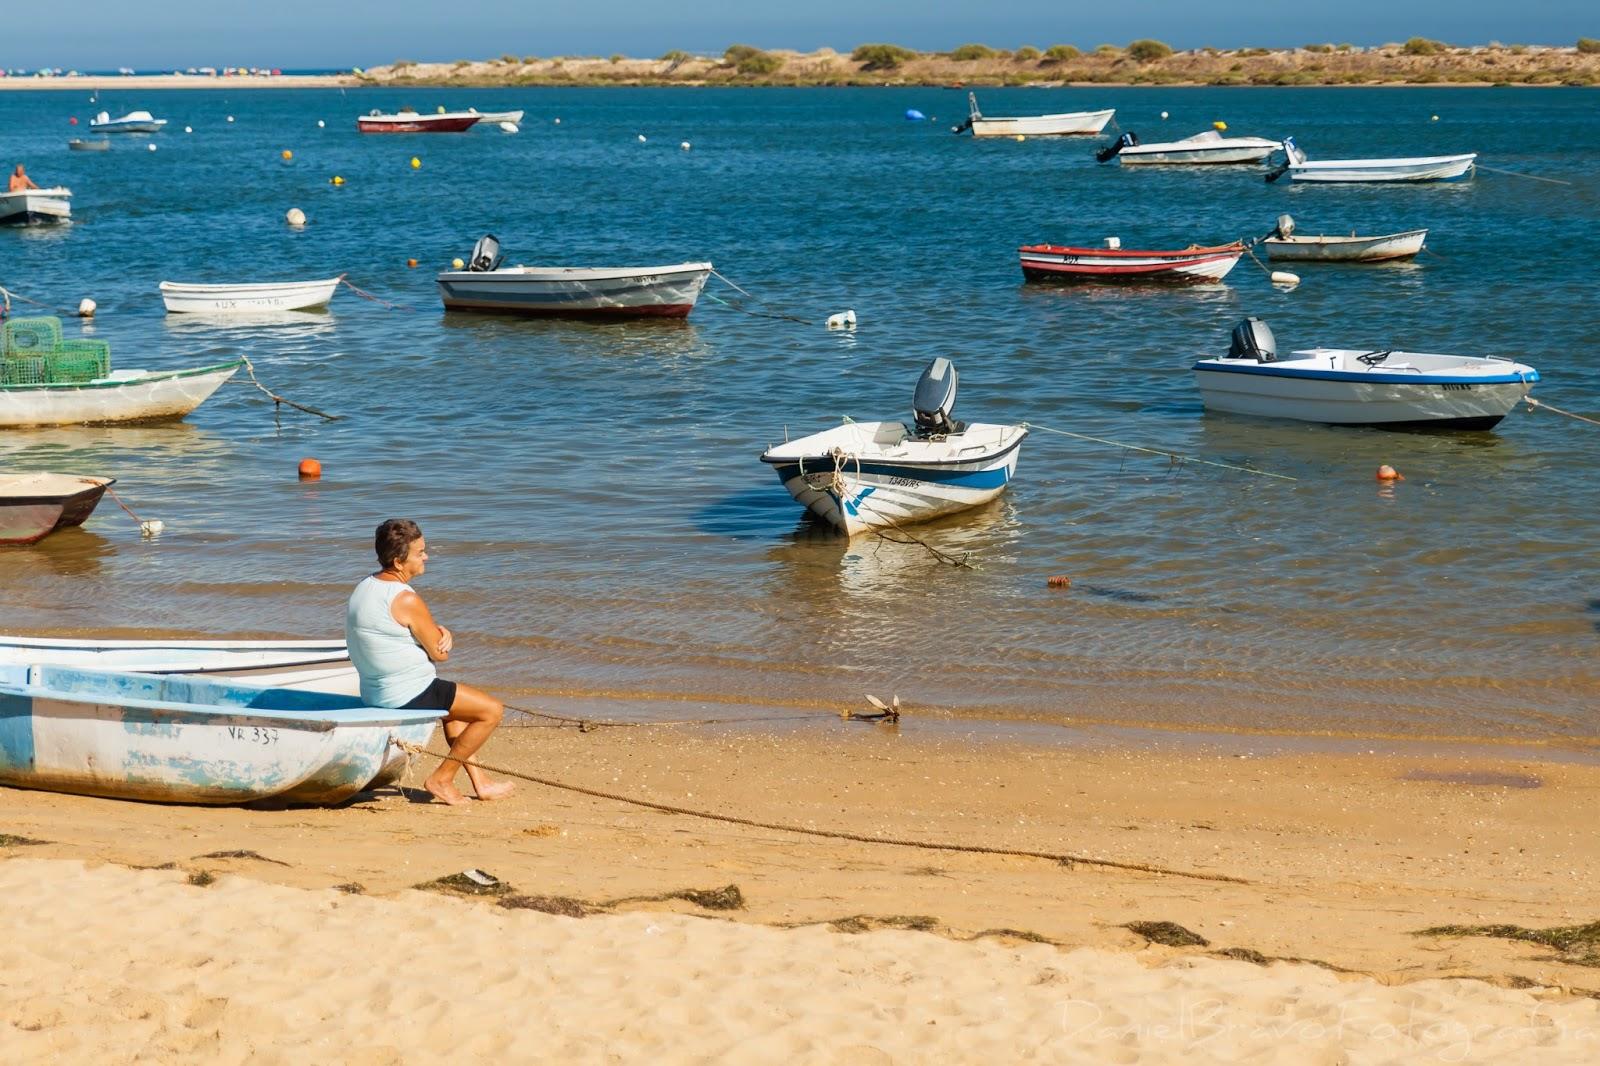 Algarve, Portugal, Caçela Velha, mar, agua, playa, sol, vacaciones, Tavira, Fábrica